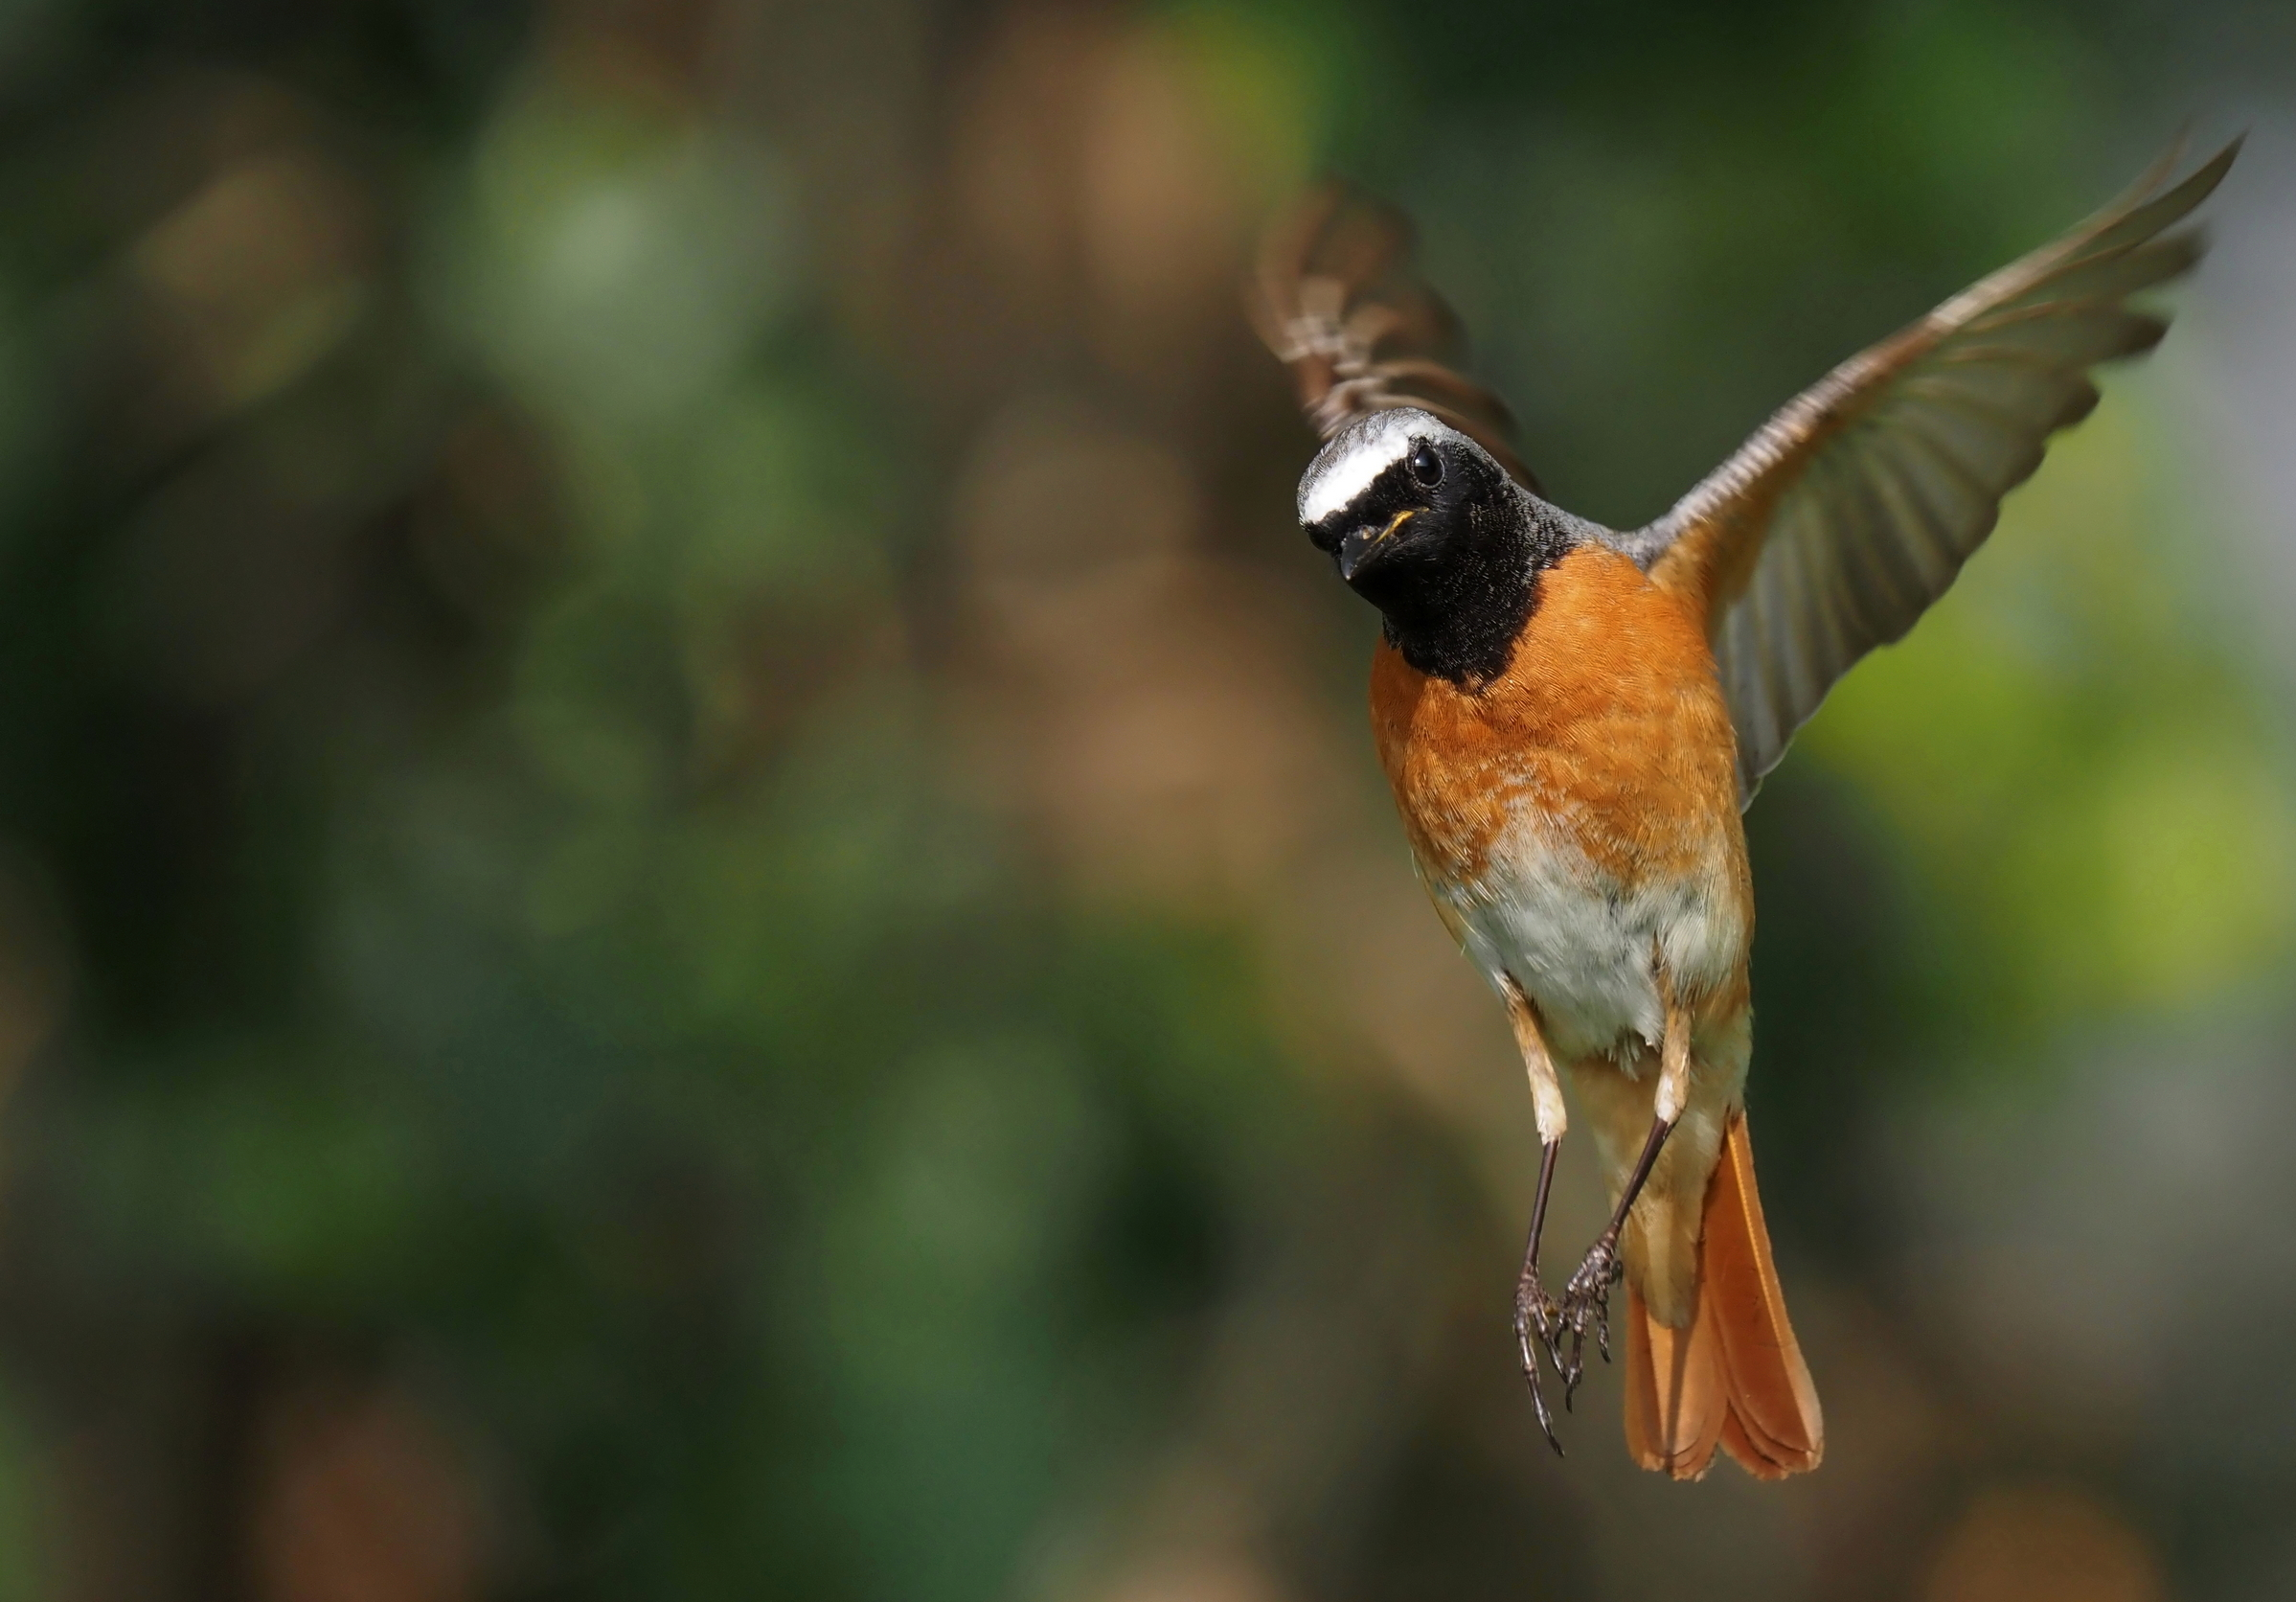 Suspended in flight...